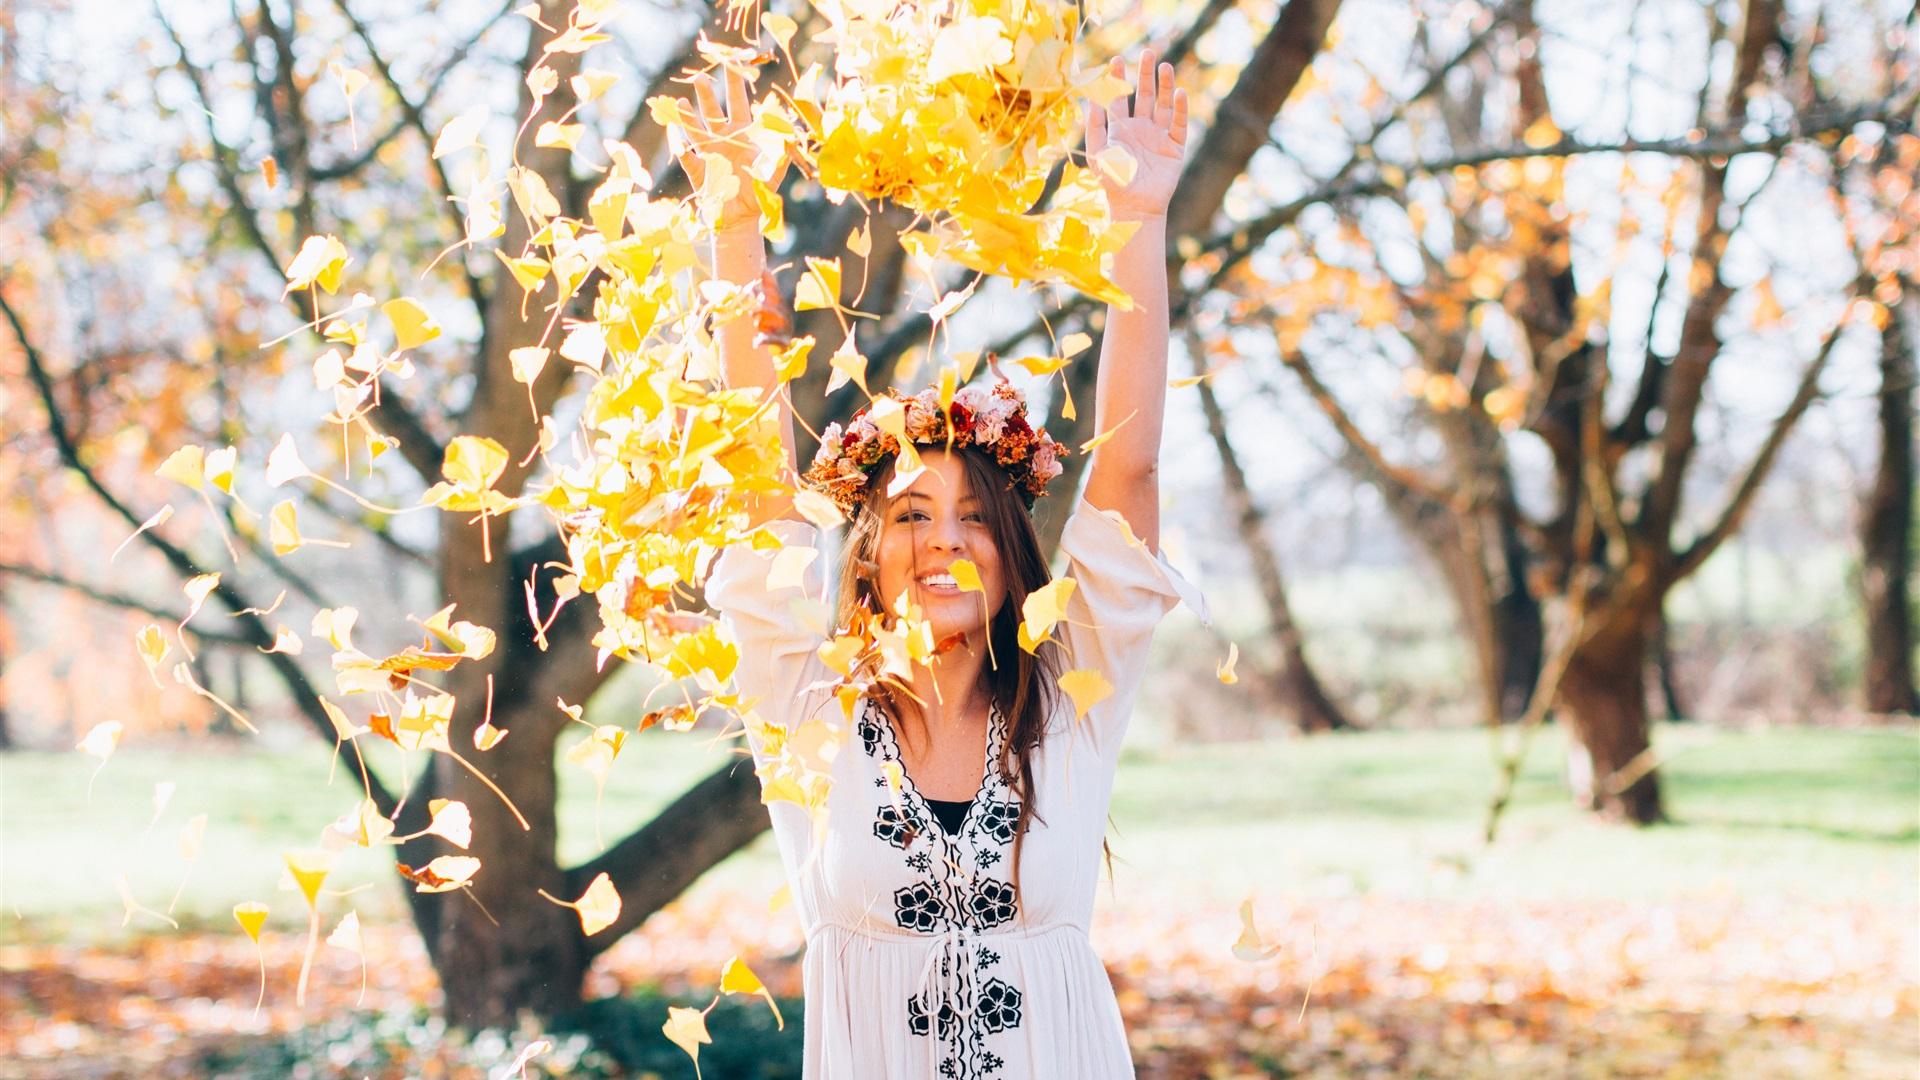 autumn wallpaper hd free